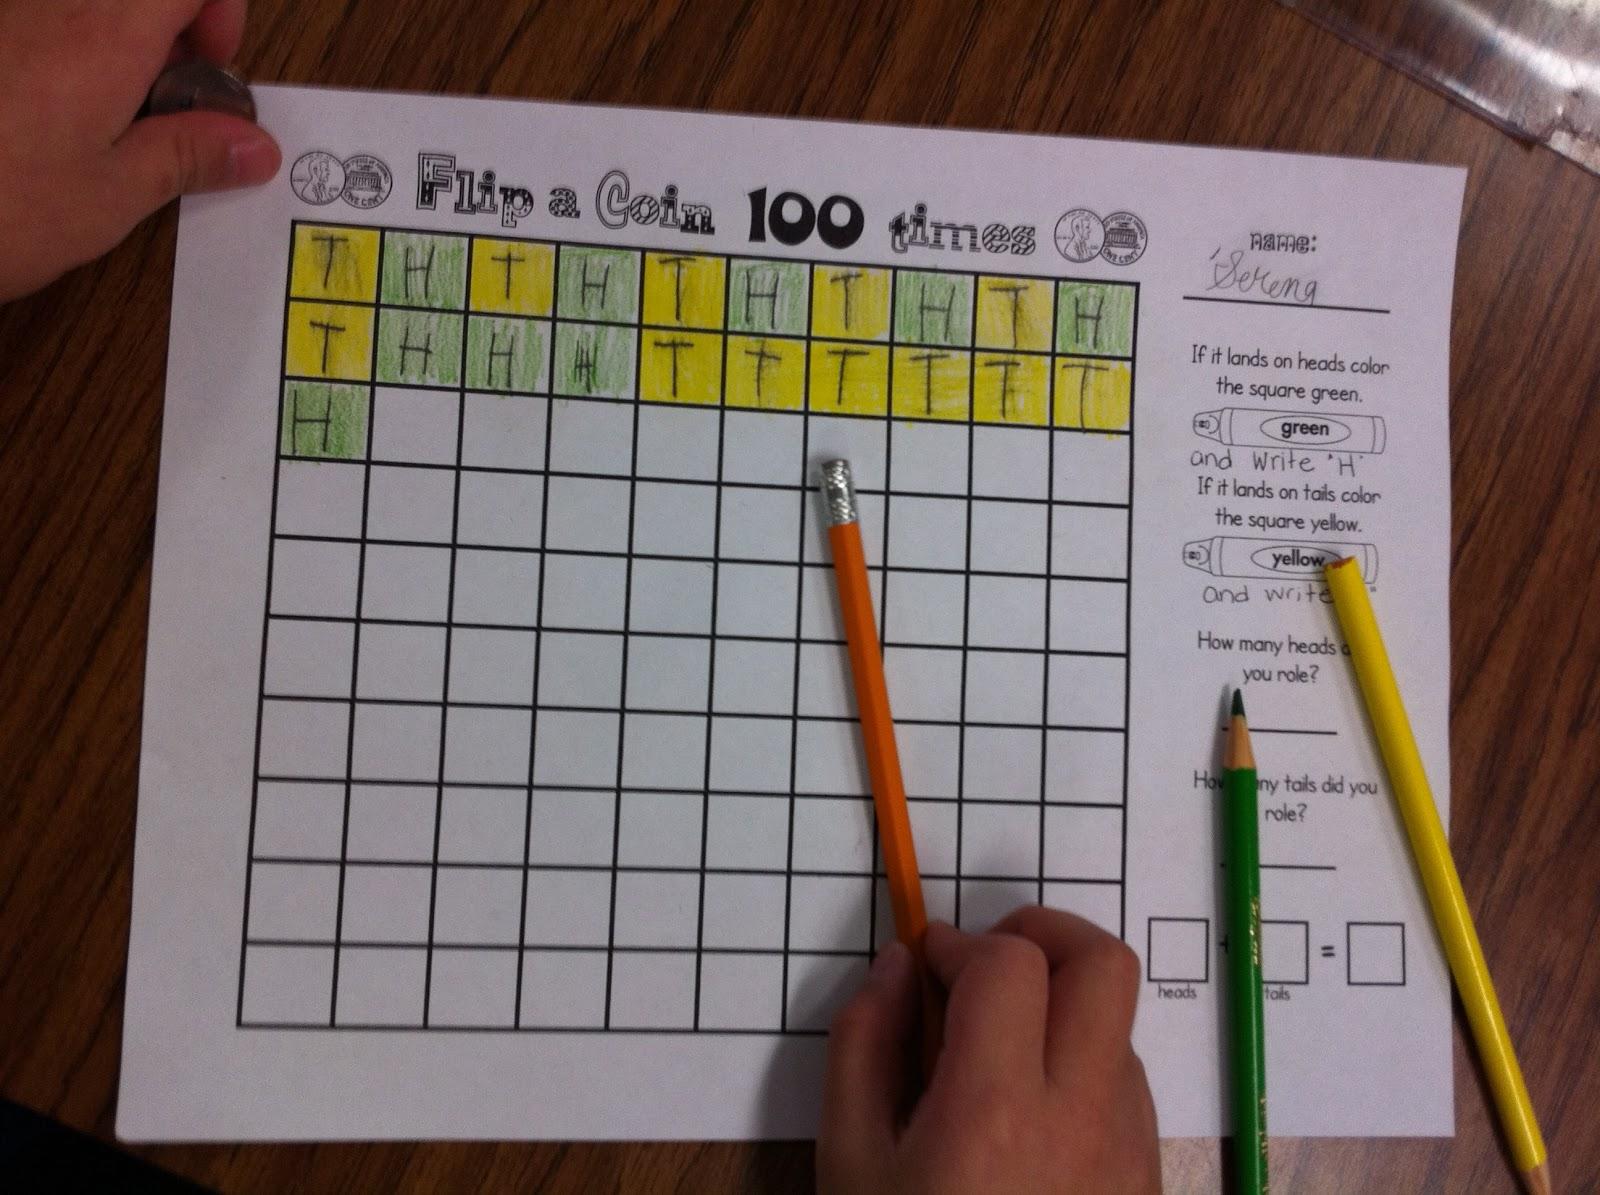 Kinderpond 100th Day Of School Feb 4th